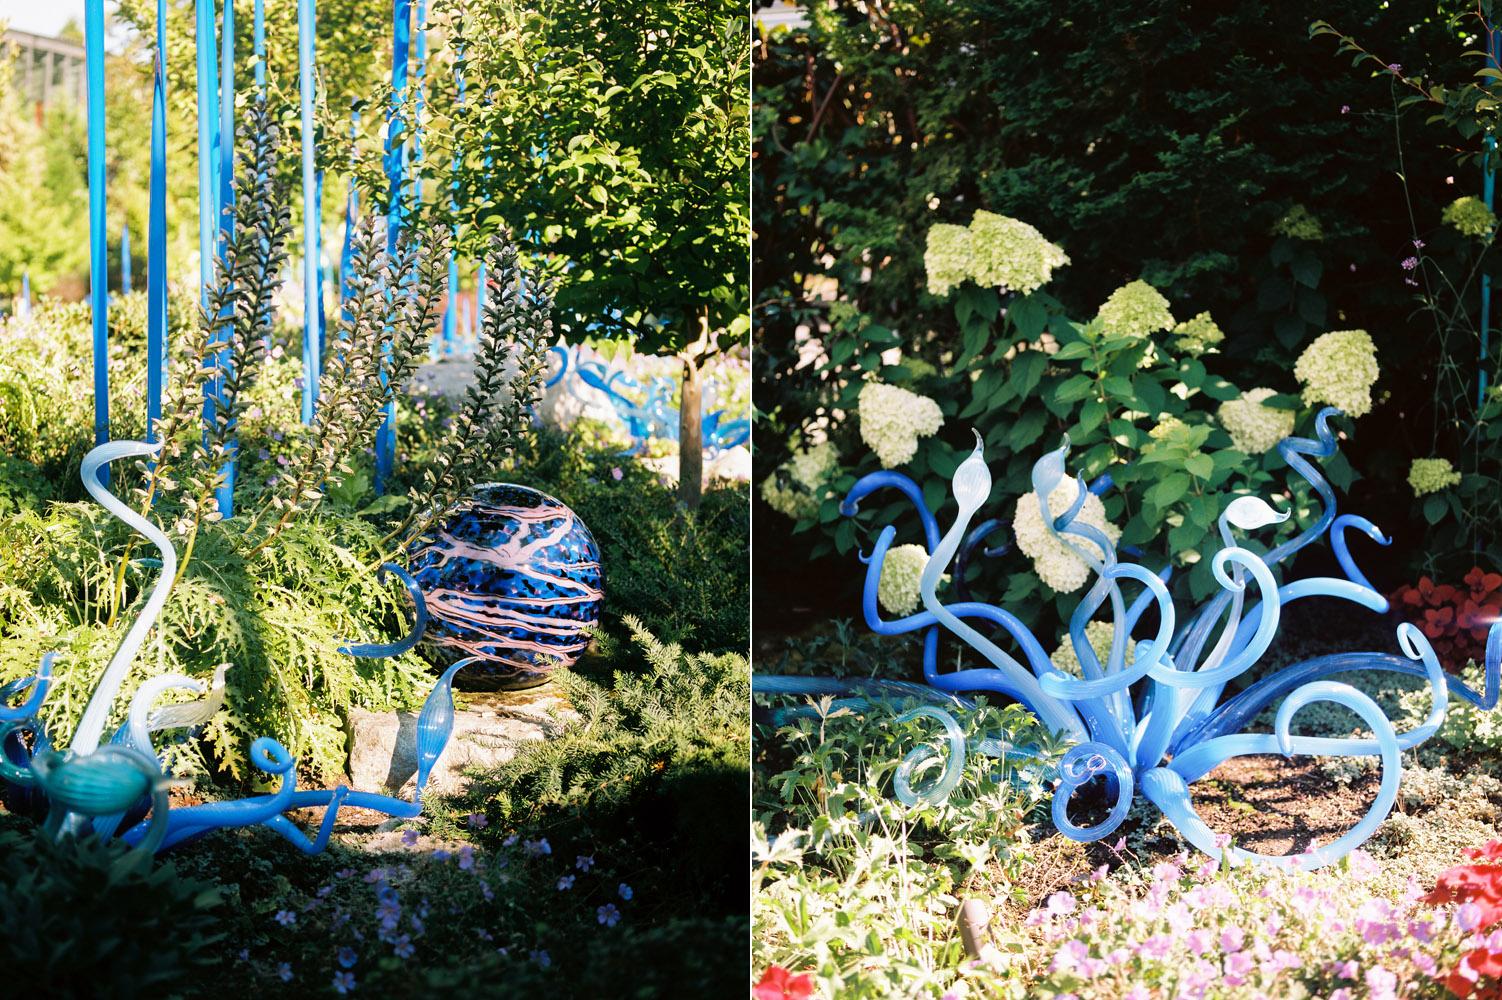 chihuly garden of glass 5.jpg